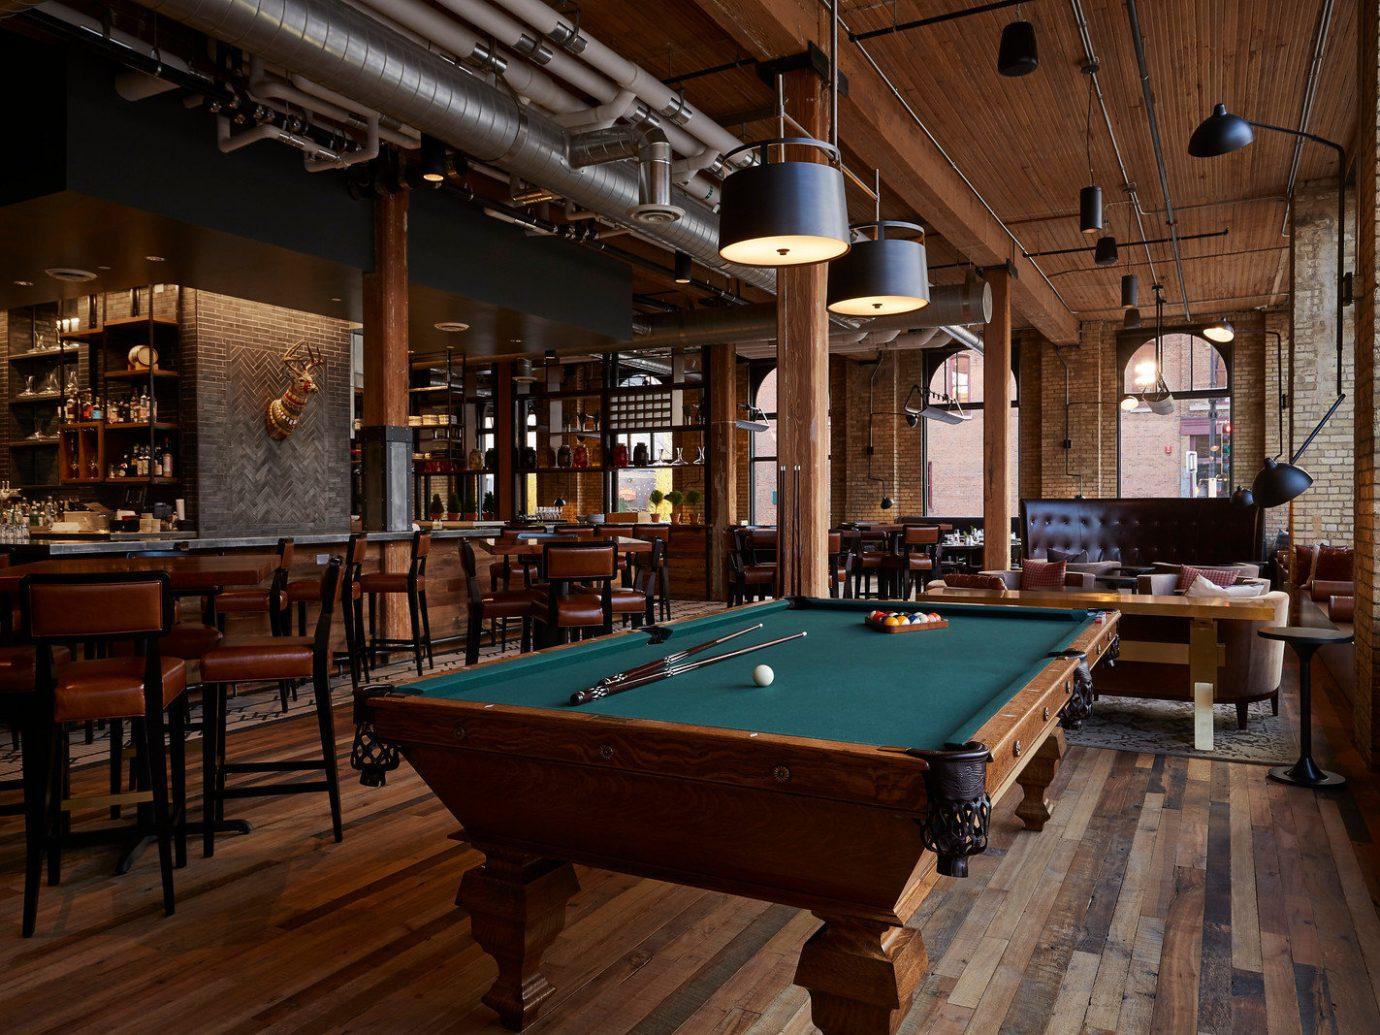 Trip Ideas floor table indoor billiard room recreation room room building estate ceiling cue sports interior design Bar billiard table games wood furniture